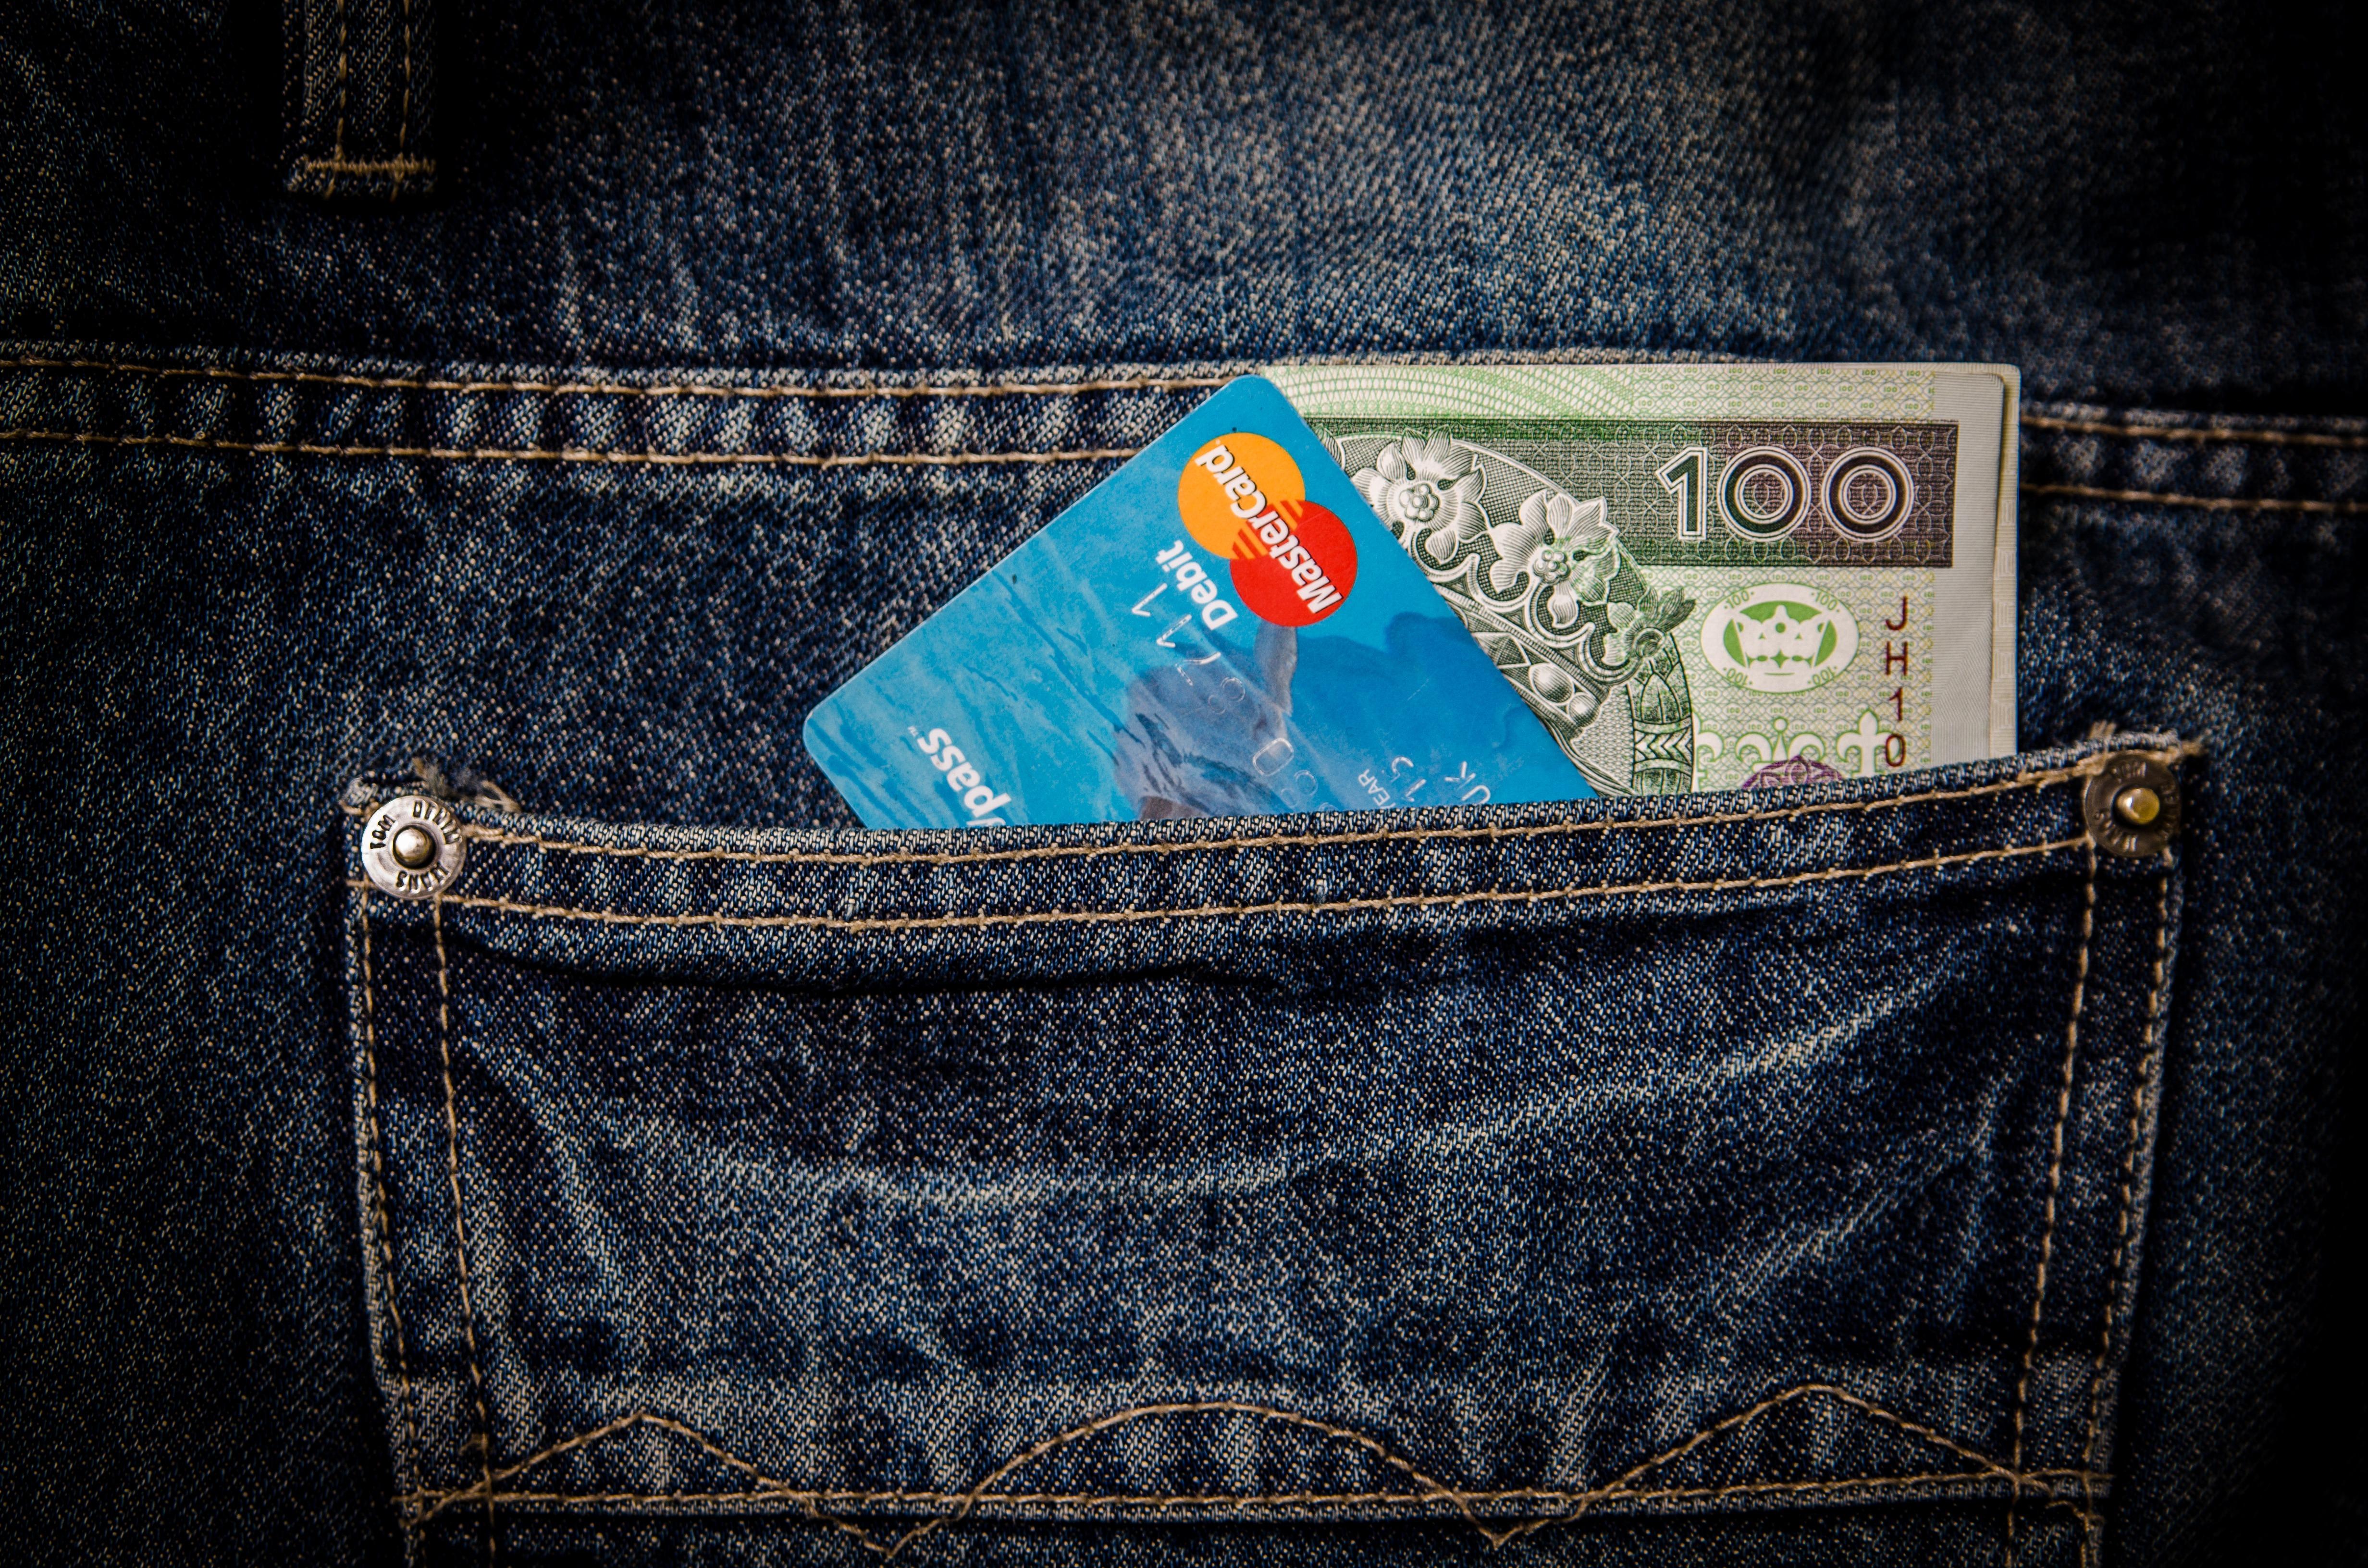 kulit uang tas biru bisnis perbelanjaan denim tas tangan kartu dompet merek tekstil membeli saku Visa